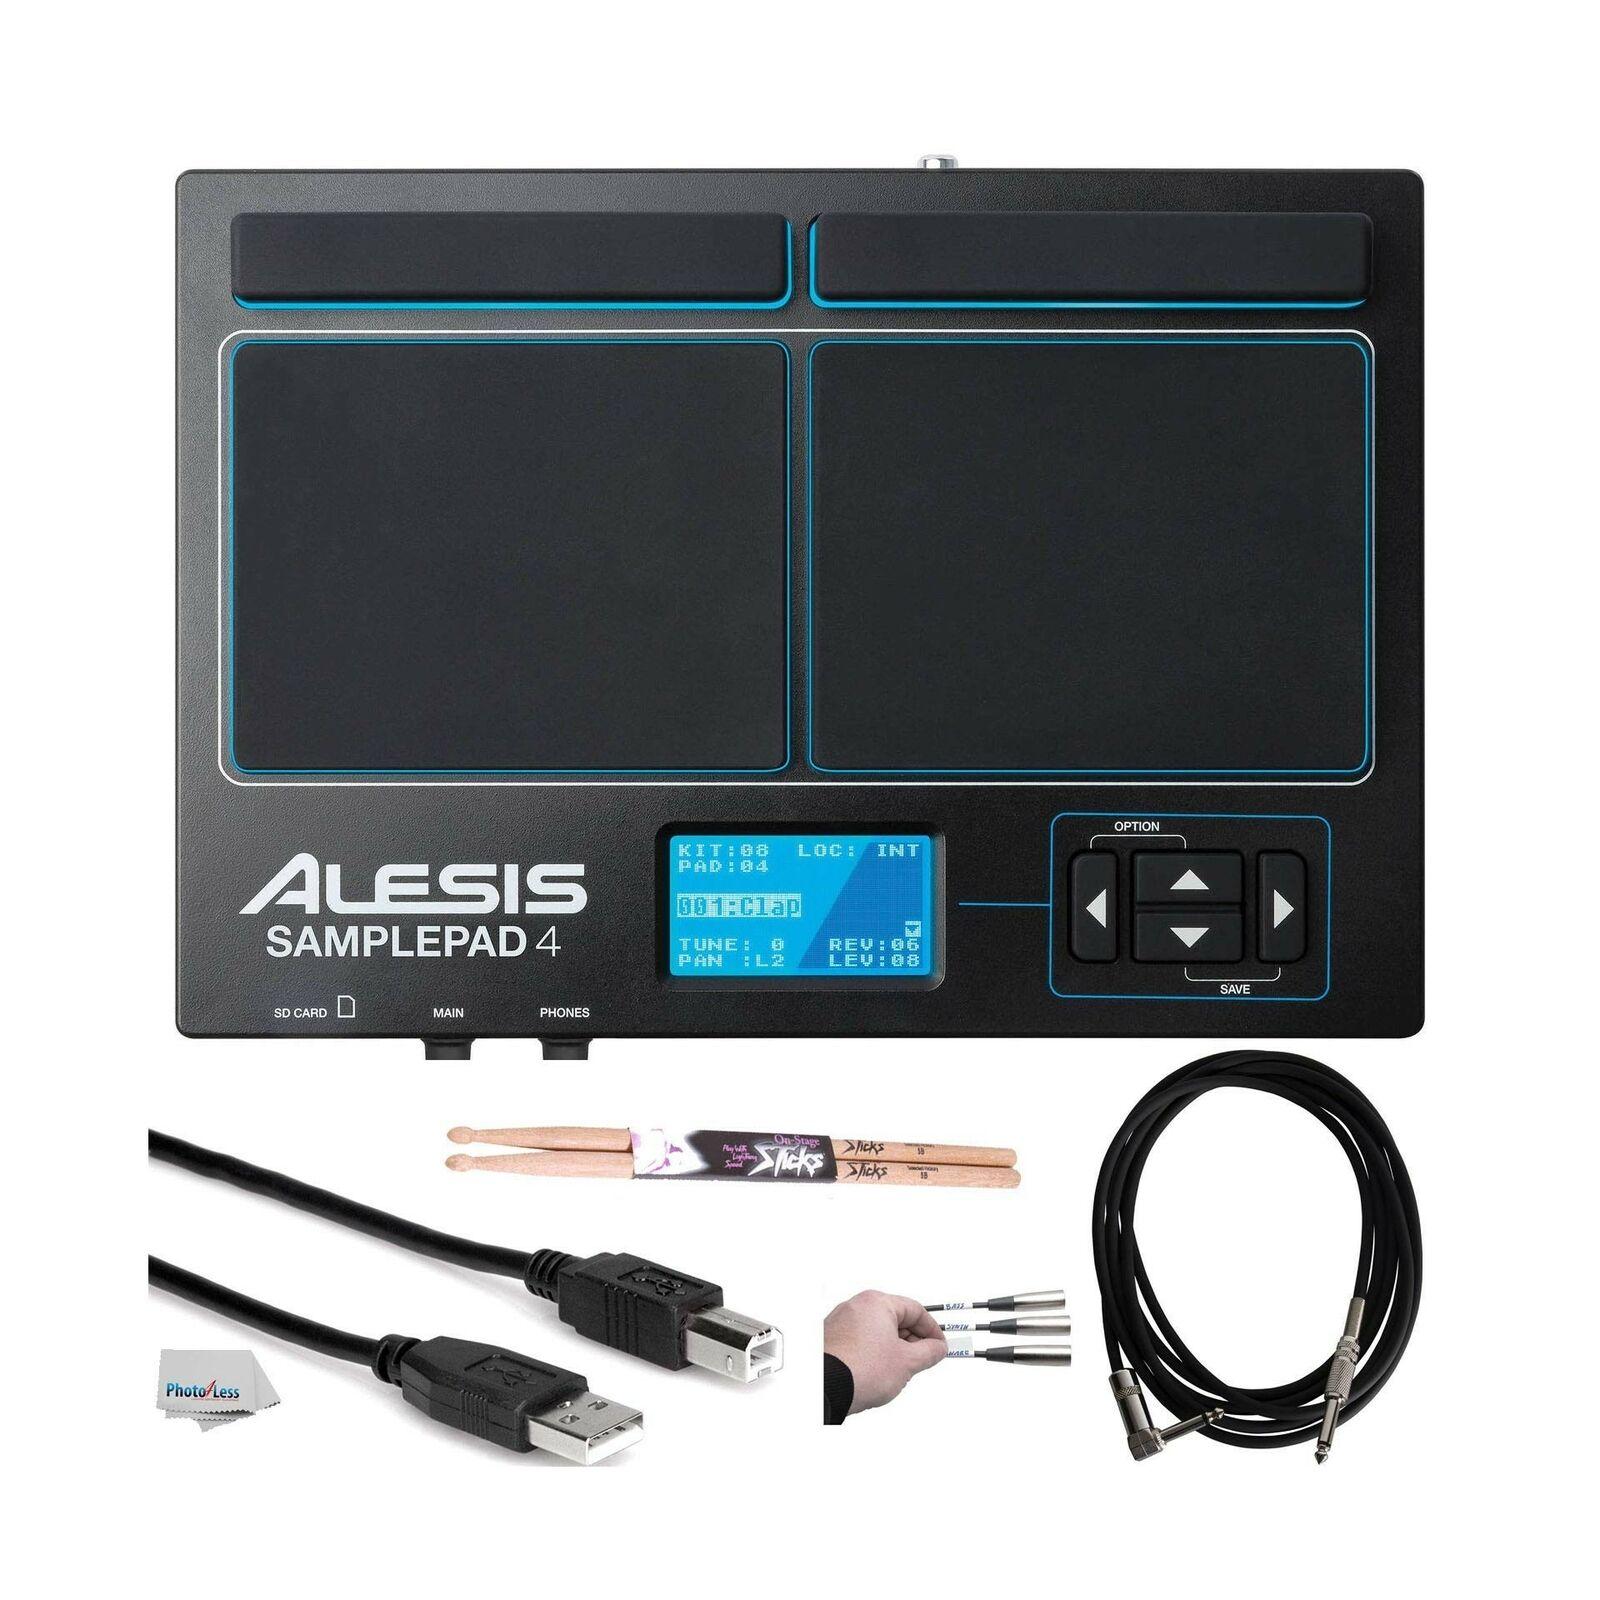 Alesis SamplePad 4Kompaktes 4-Pad Percussion und Sampleauslösende Instrumente...